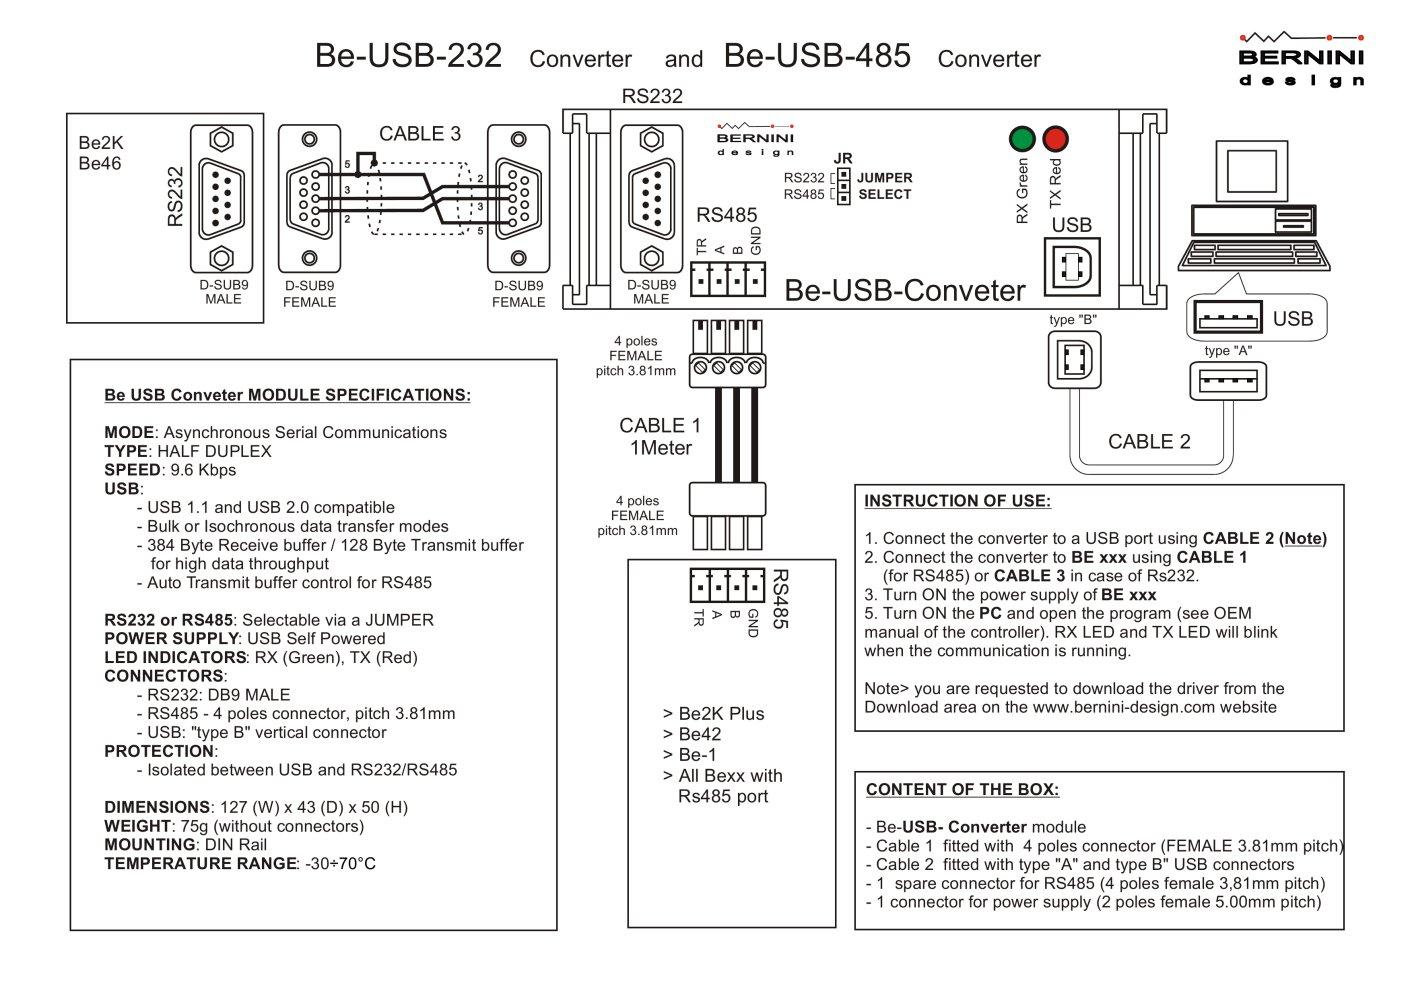 Rj45 Connector Wiring Diagram View Diagram Rj45 Wiring Diagram On